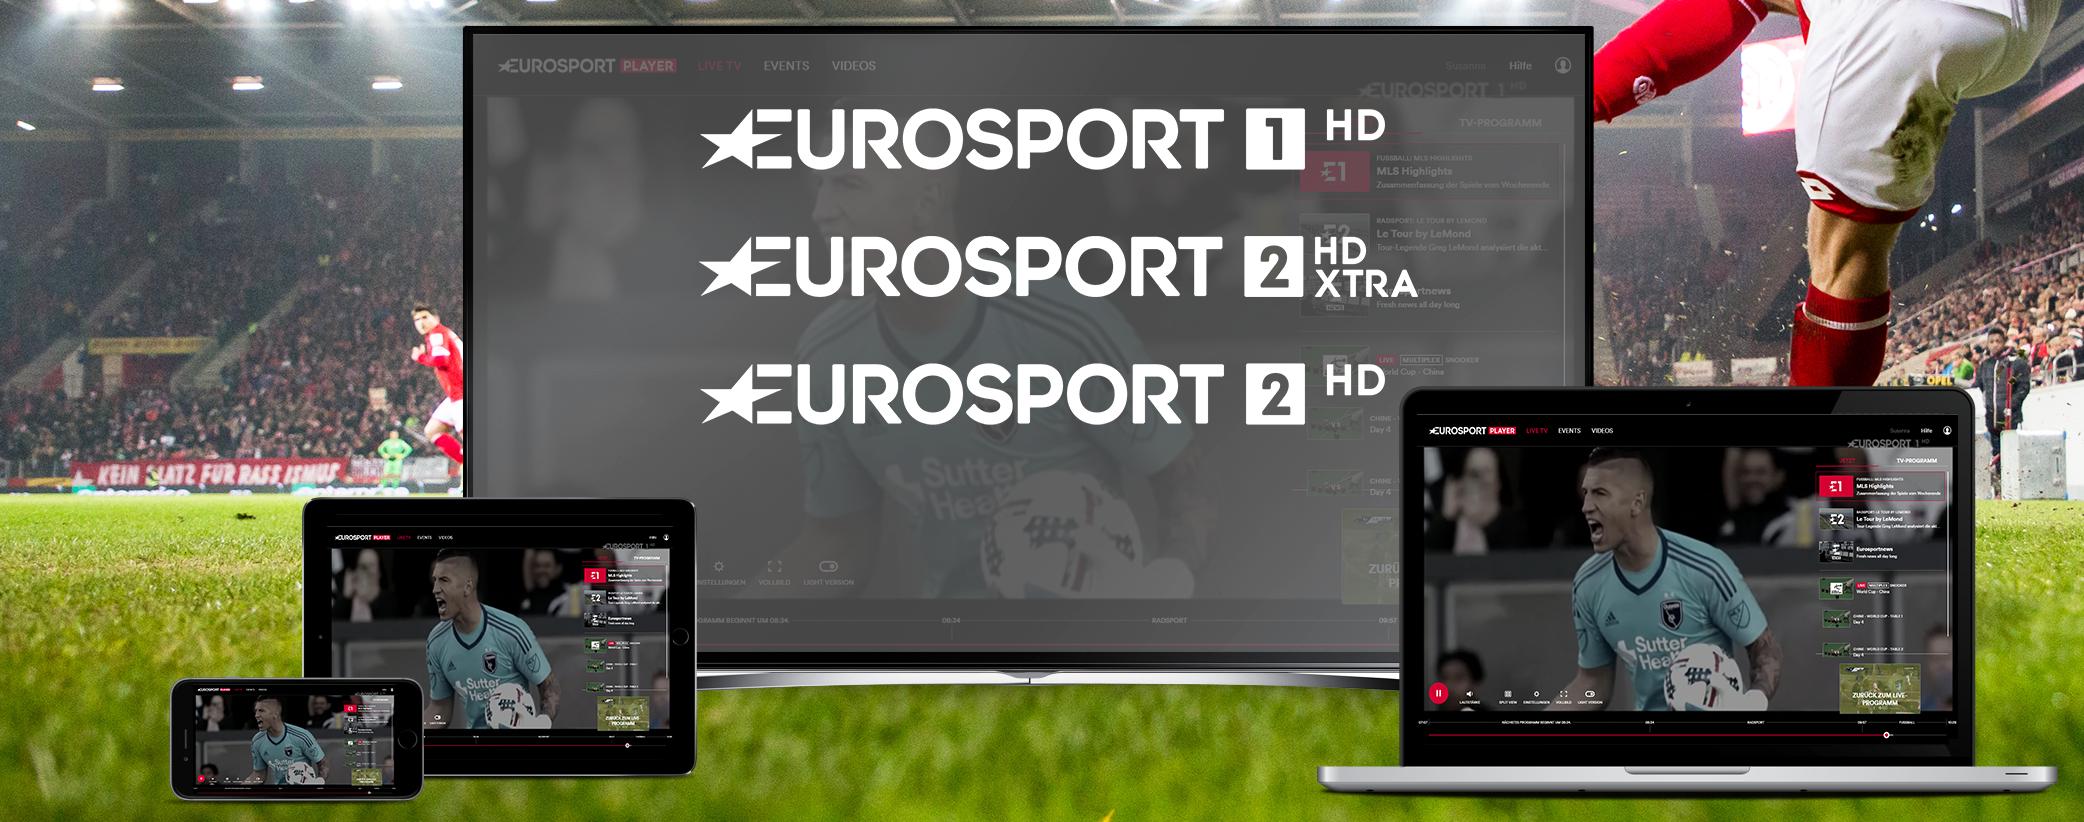 Die Kanäle bei Eurosport